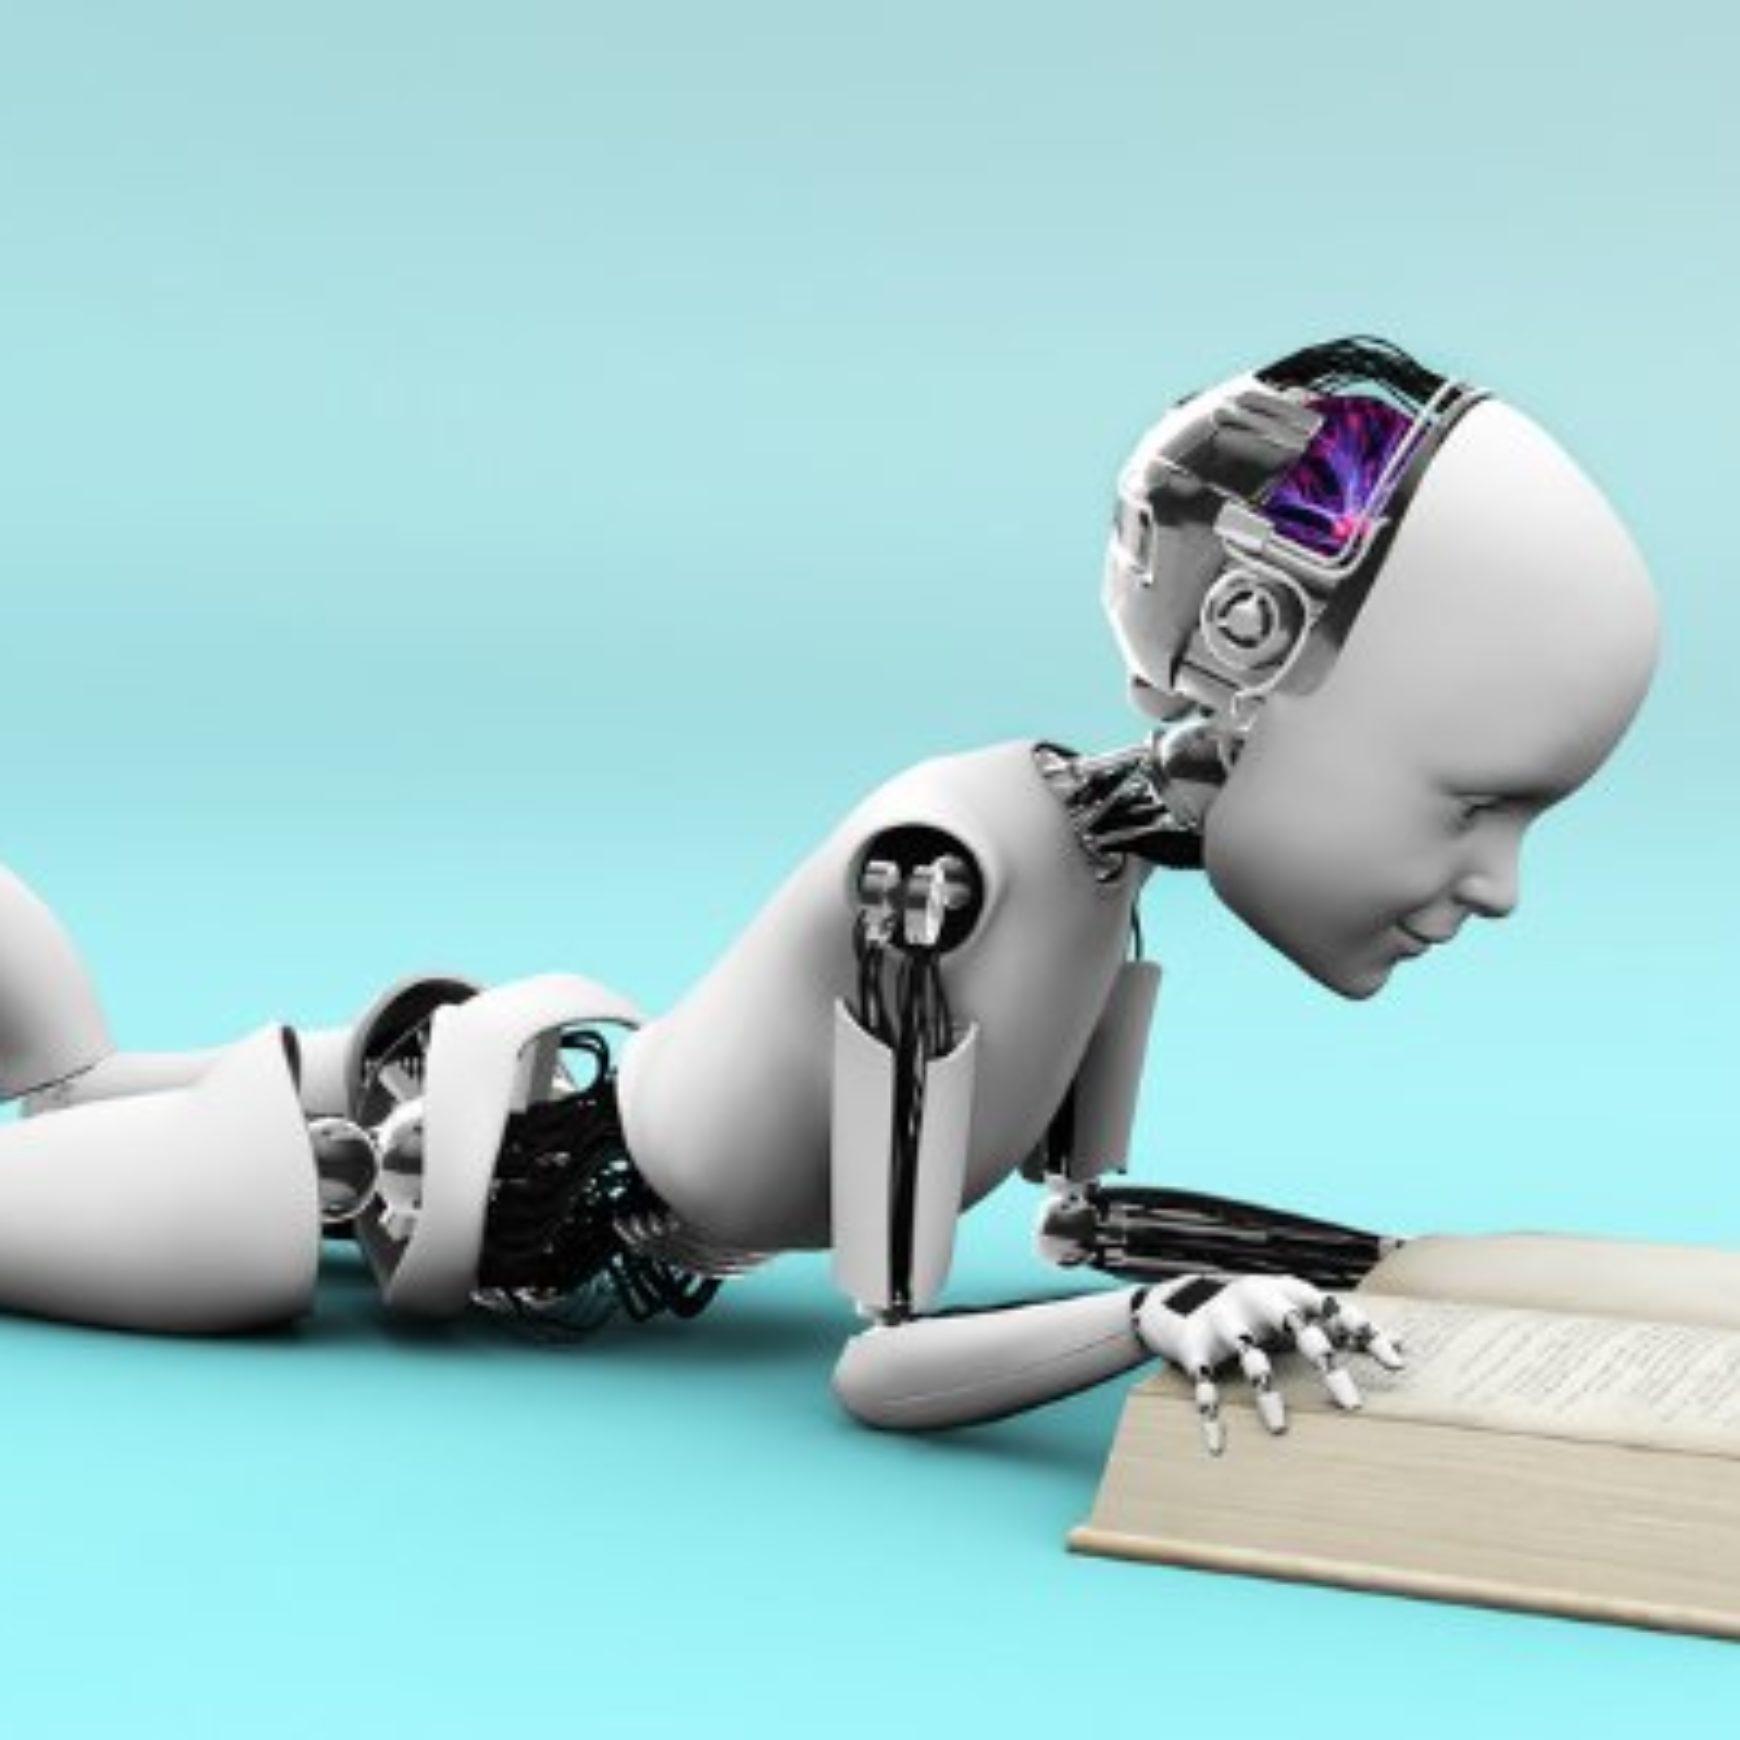 Sistemas Cognitivos e Machine Learning